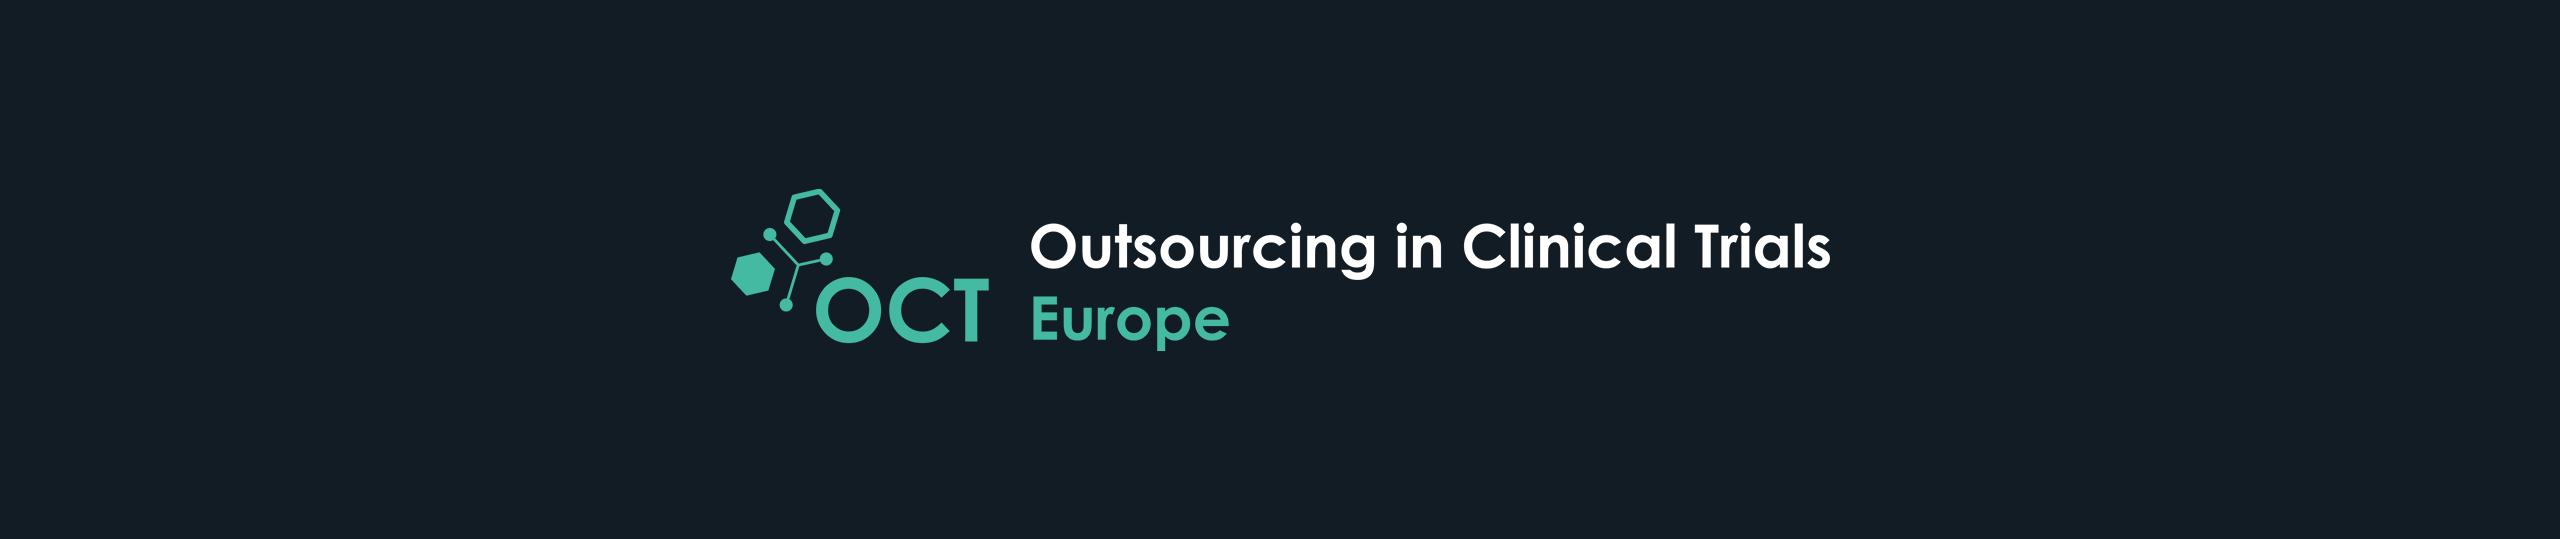 OCT Europe